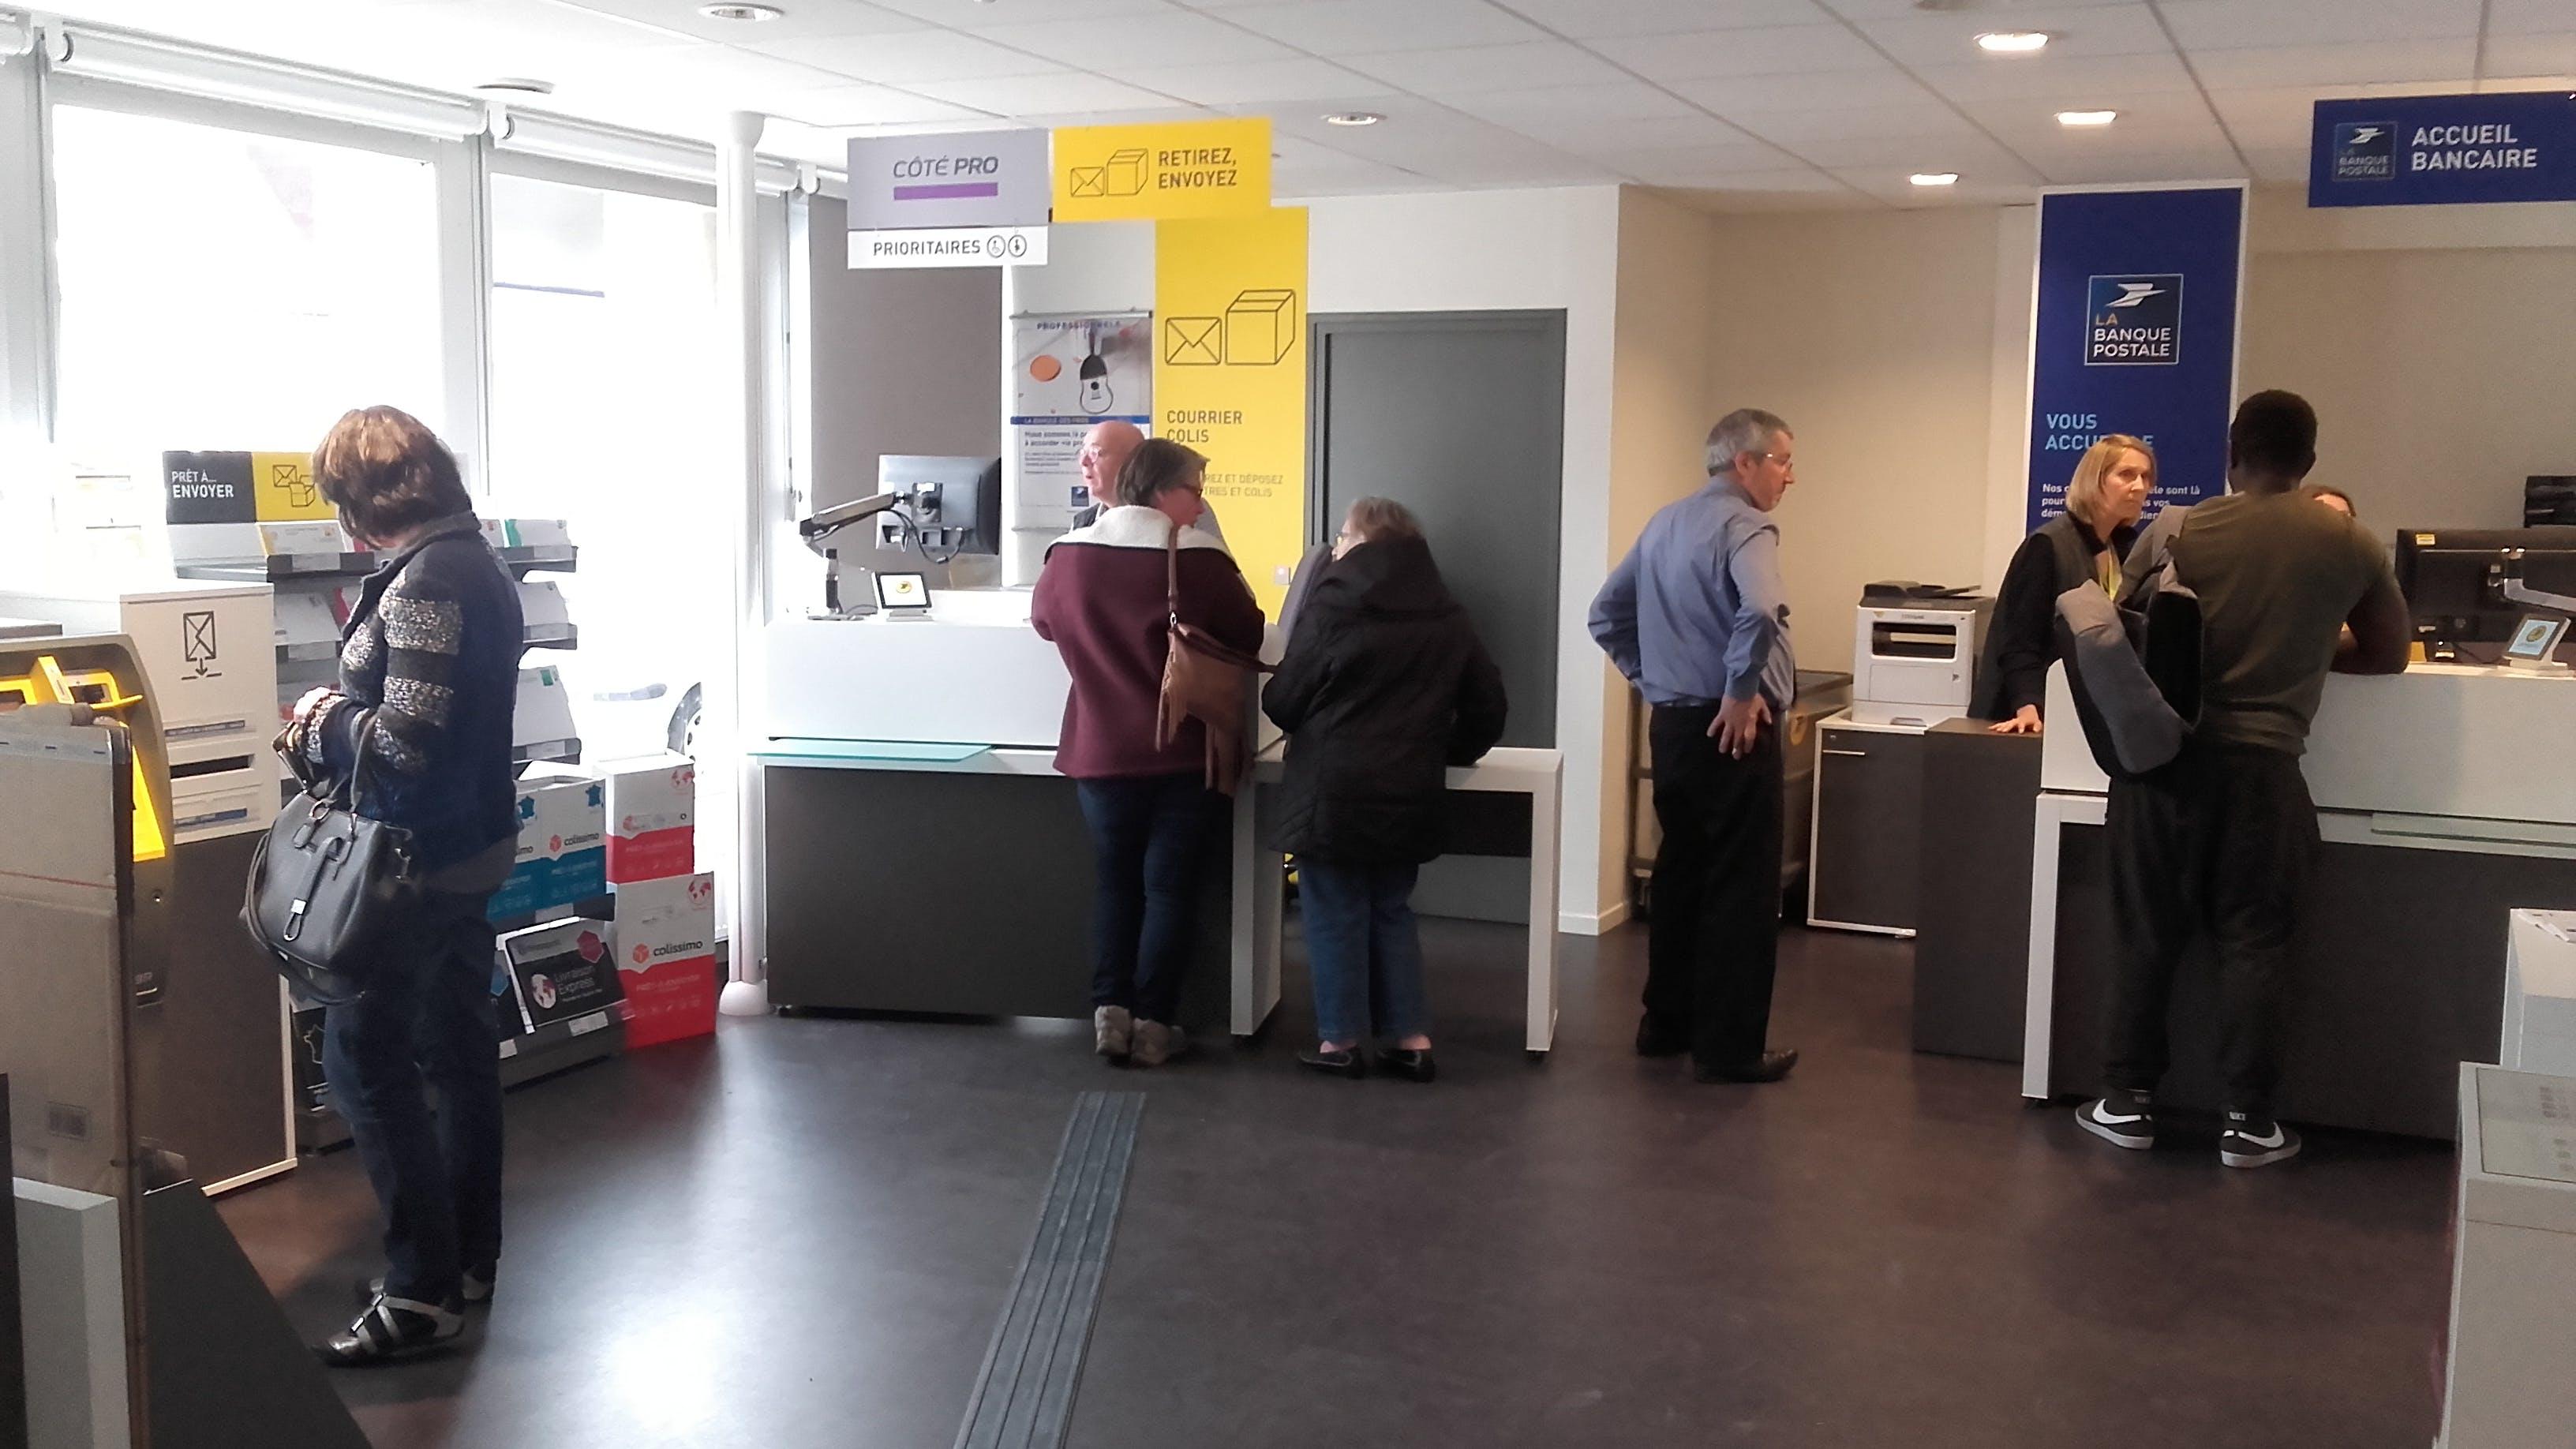 Recently reopened post office in Vitry-en-Artois